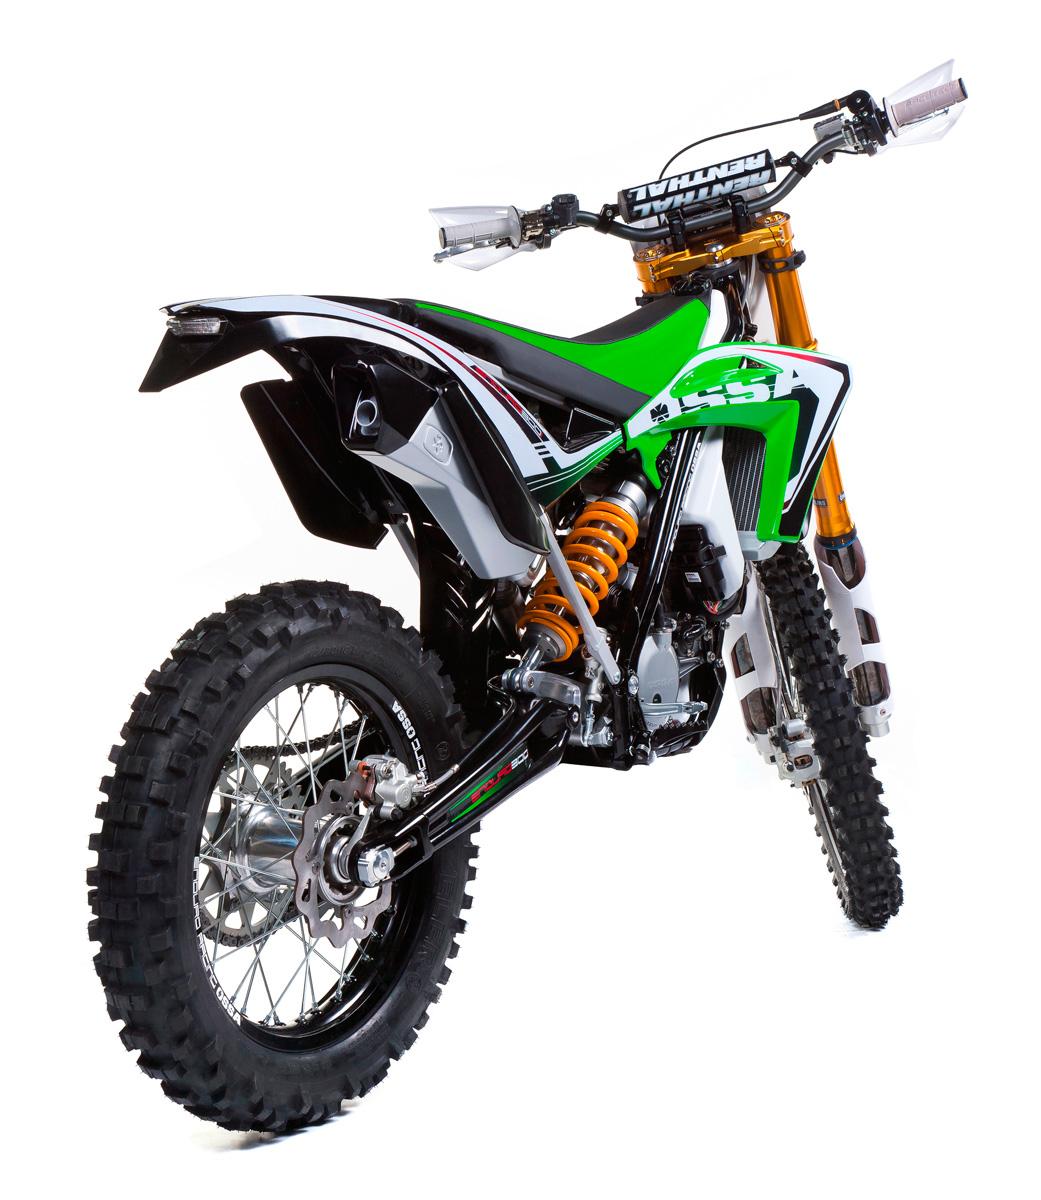 enduro ossa 300i models stroke 250i motorcycles direct motorcycle bike enduro360 trials suzuki moto launch injected posted am lewisportusa